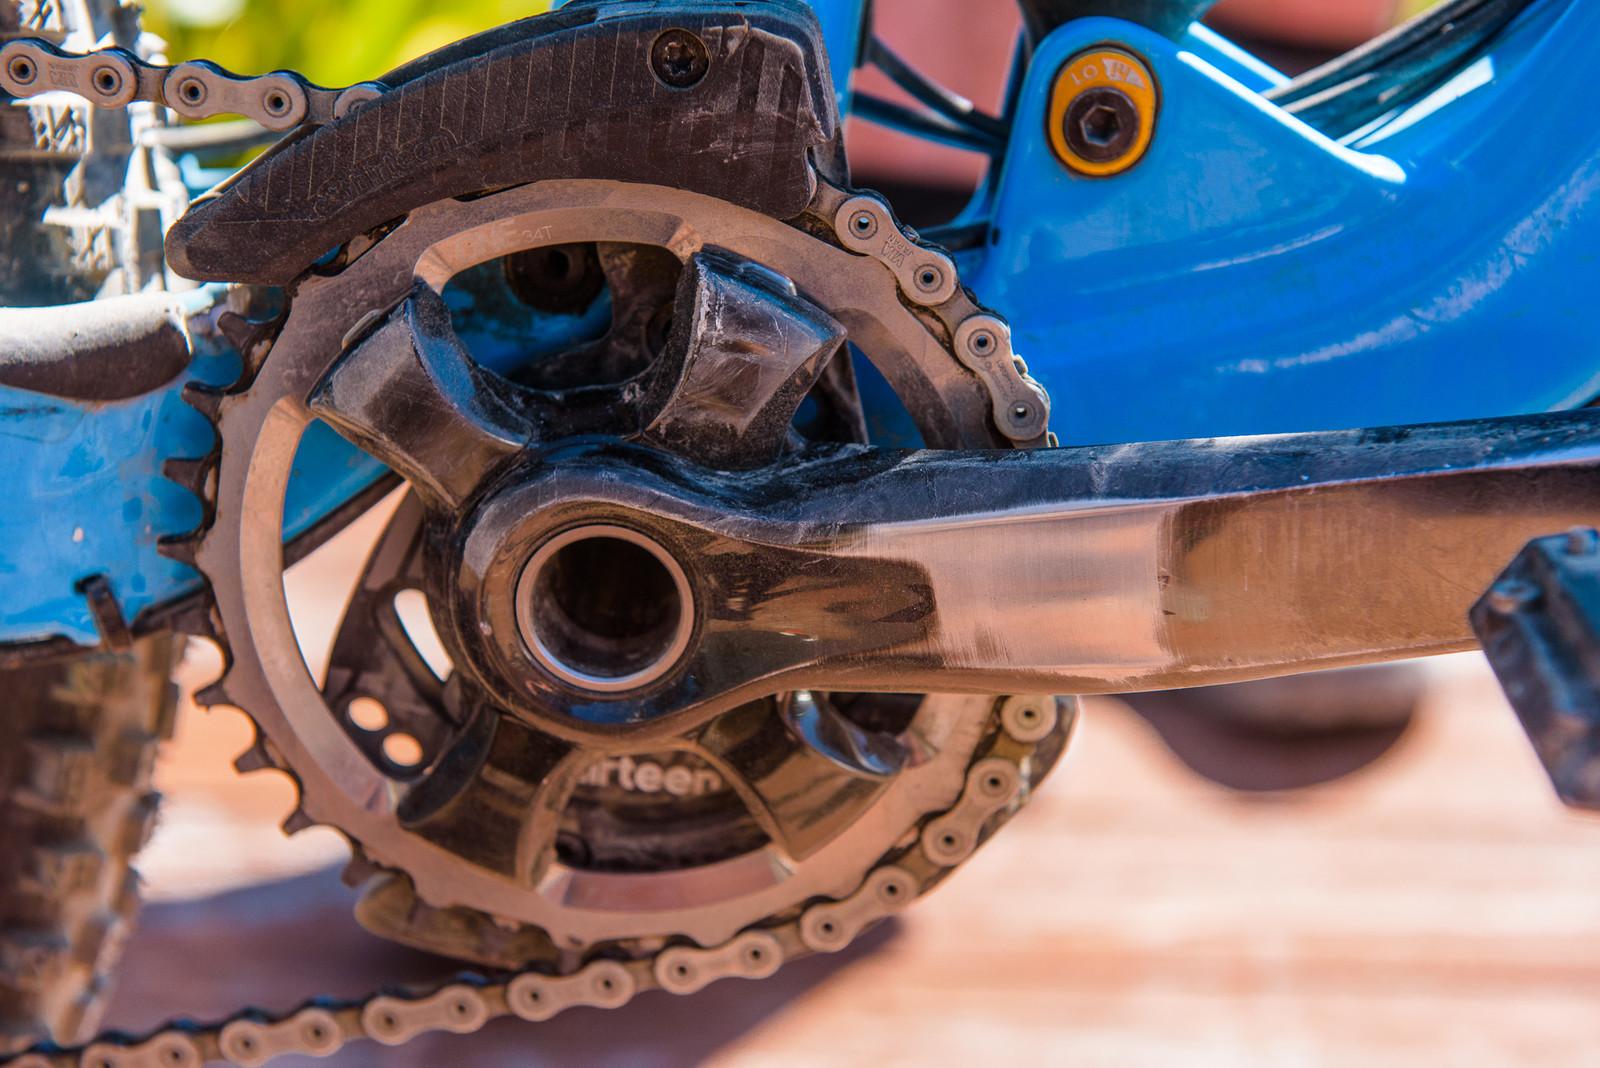 Shimano XTR Cranks - Pro Bike - Wyn Masters' GT Force, Size XL - Mountain Biking Pictures - Vital MTB